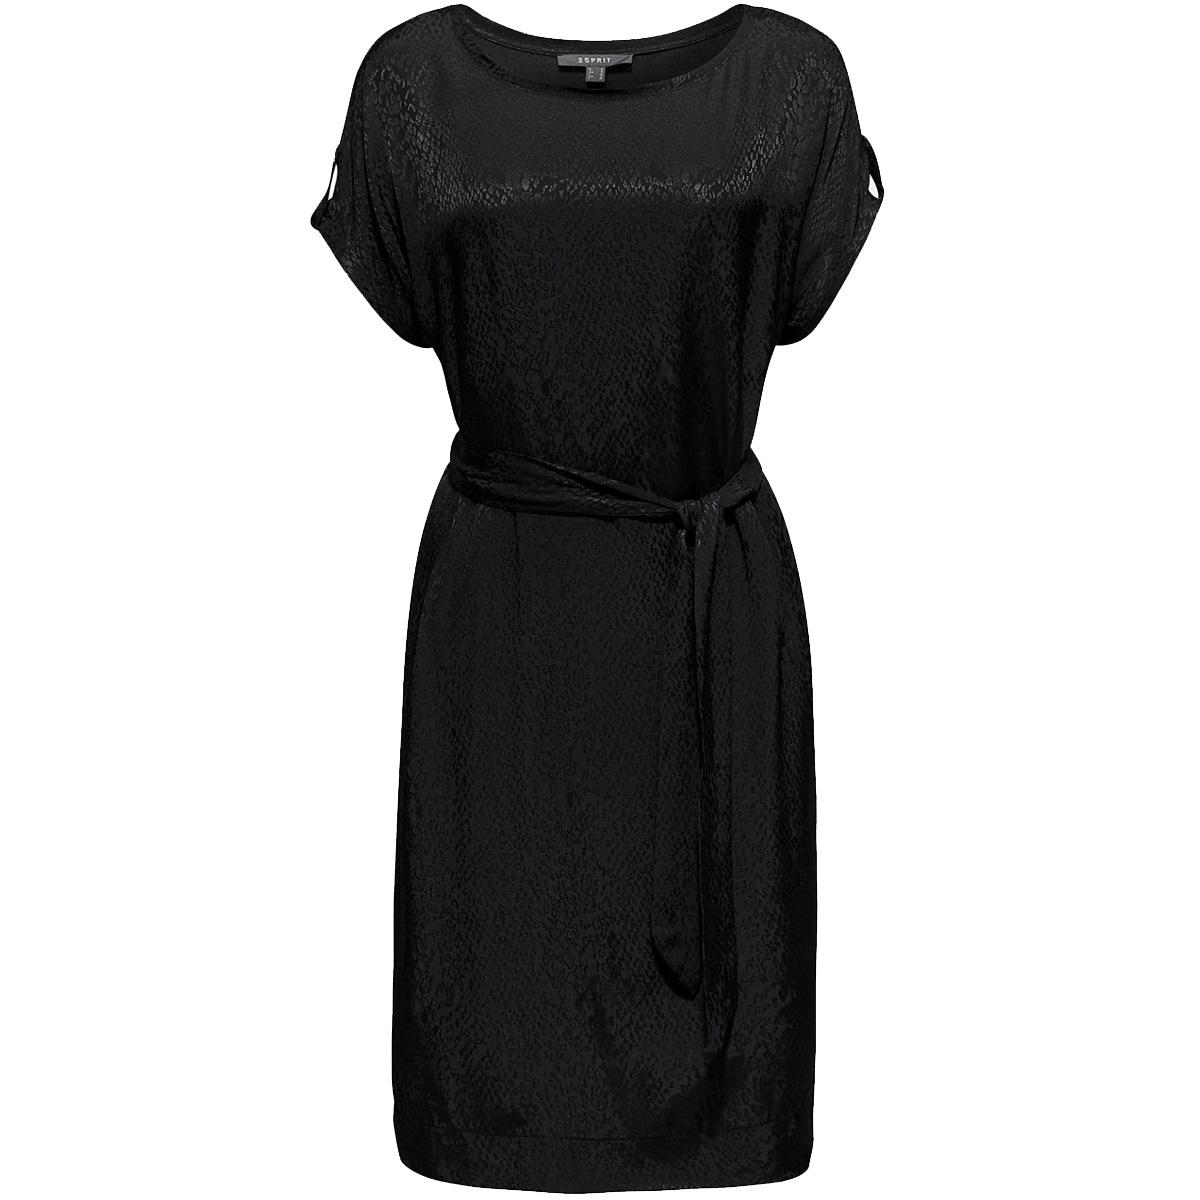 geweven jurk met luipaardstructuur 089eo1e004 esprit collection jurk e001